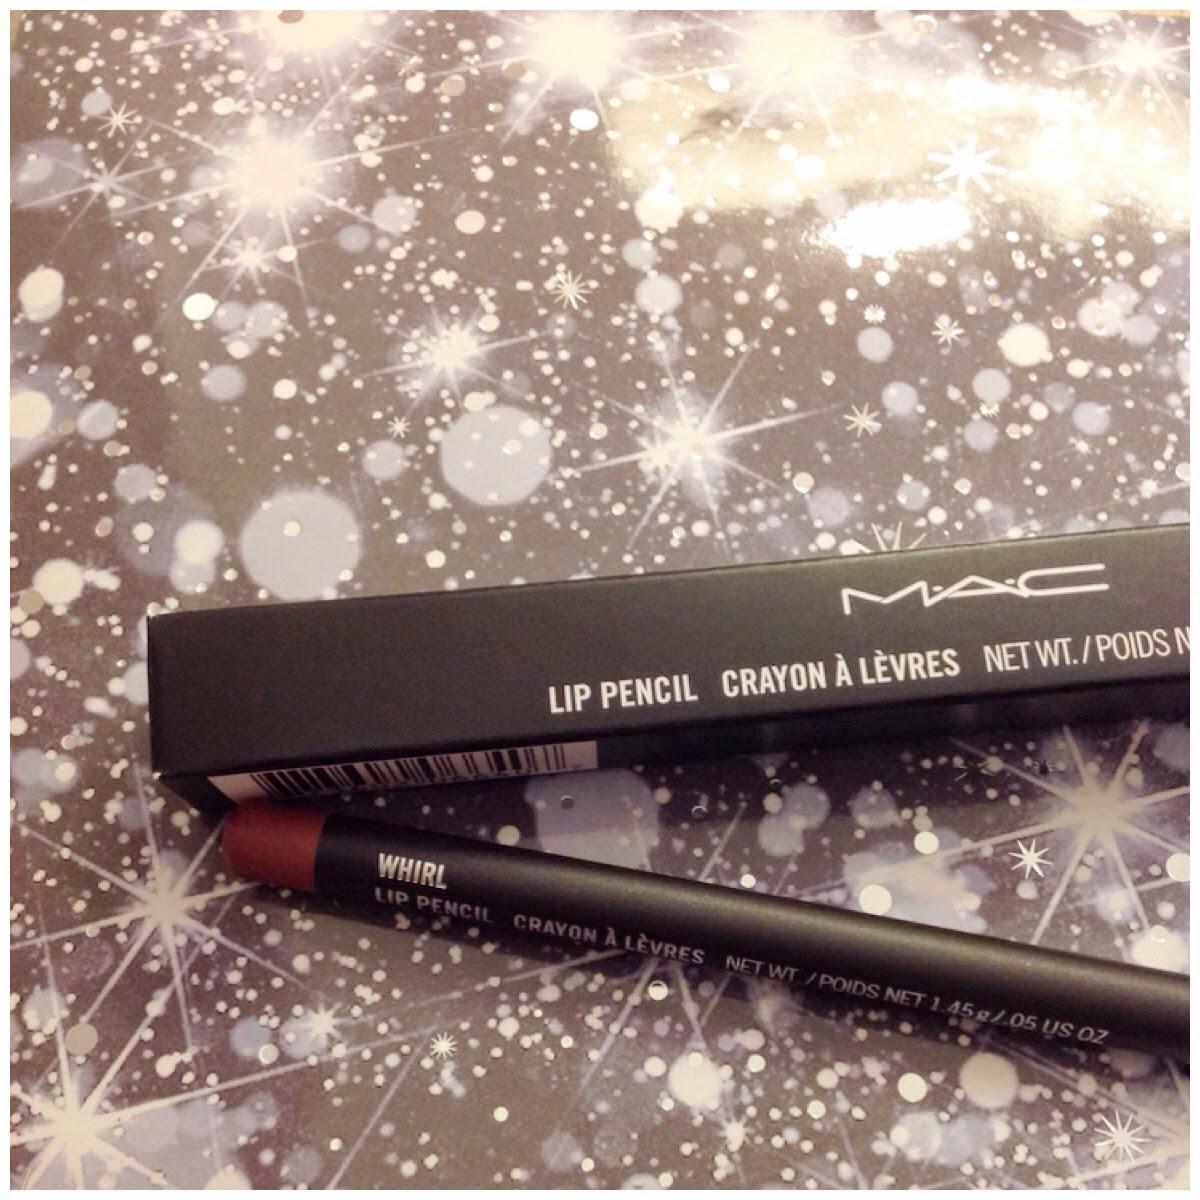 MAC Whirl Lip Pencil